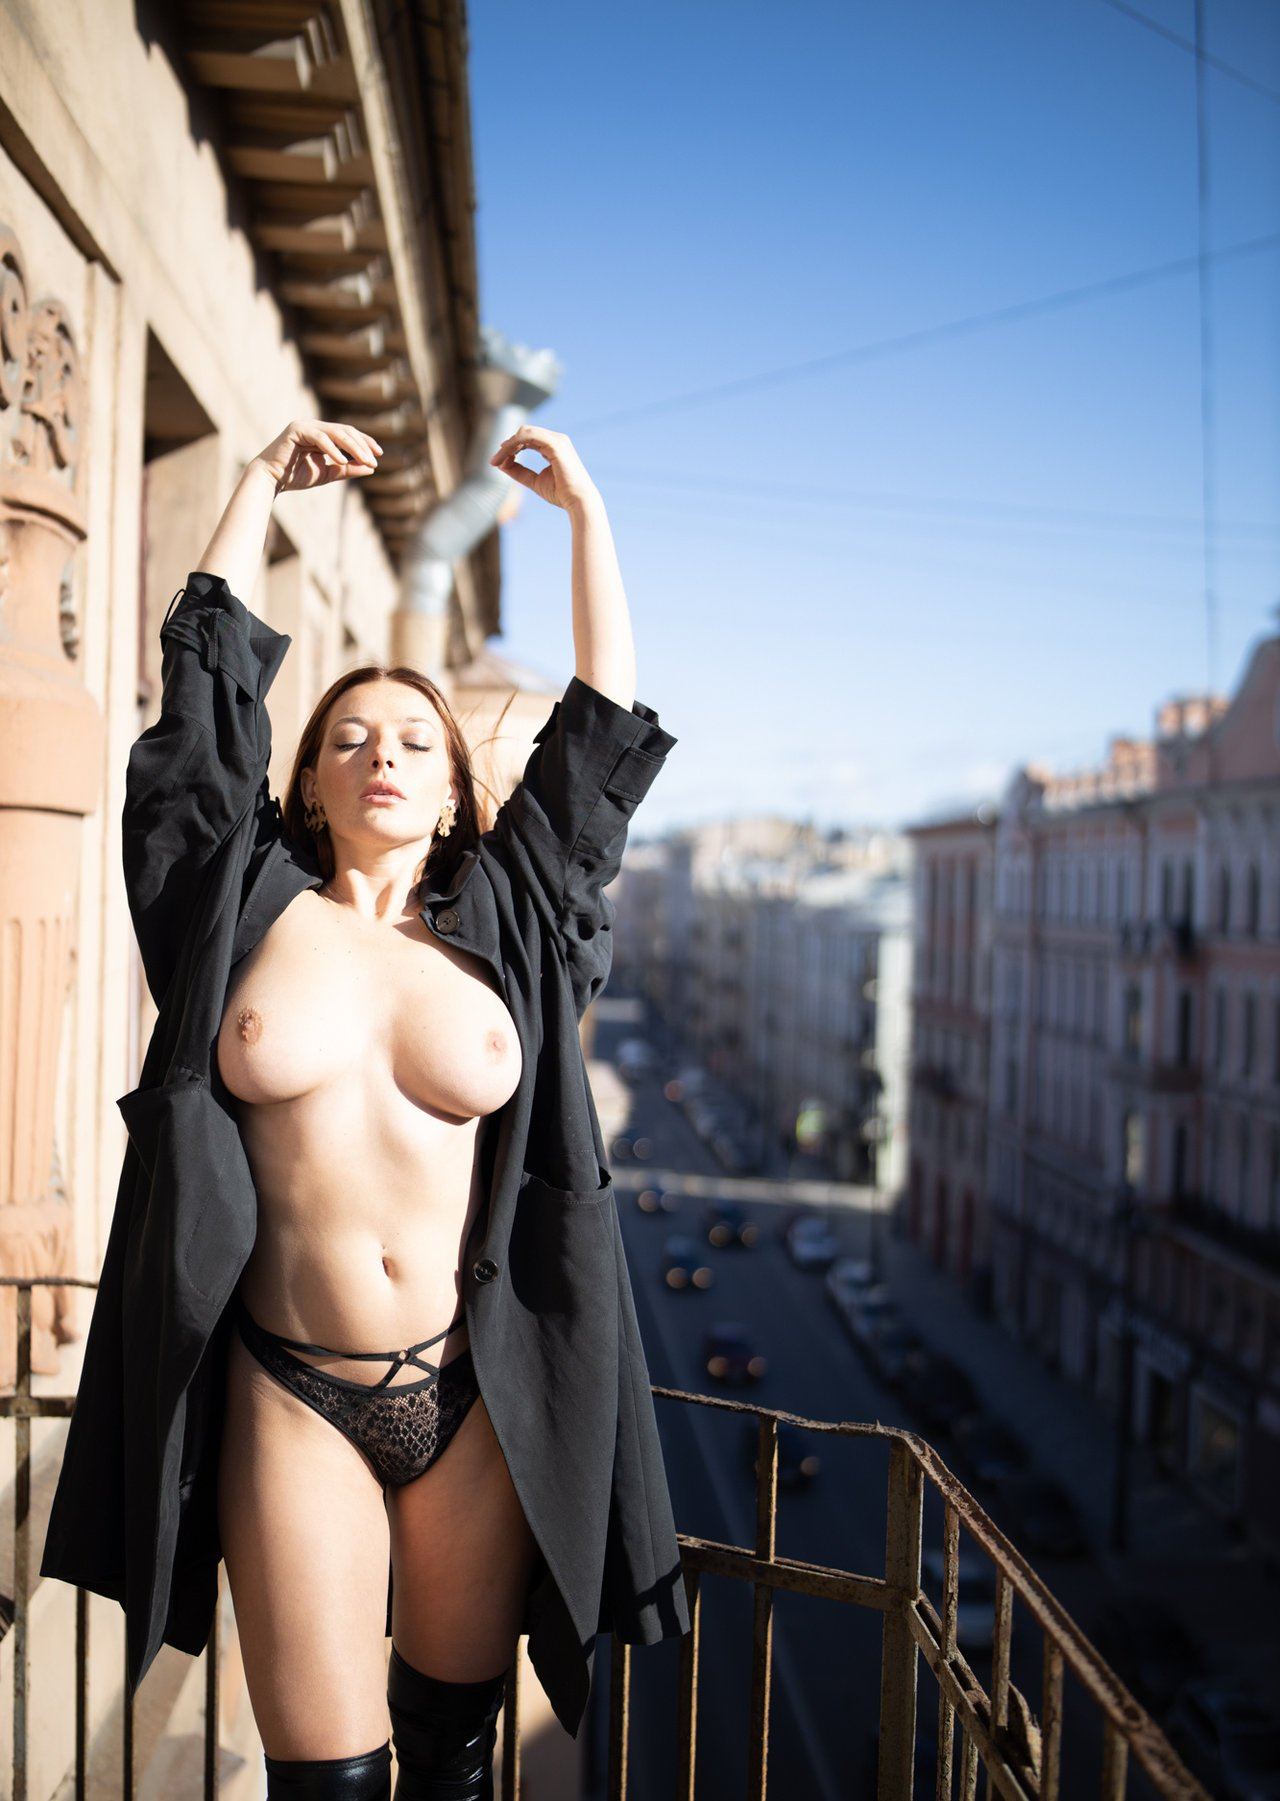 Olga Kobzar Bugs Bunny Gf Nudes Leaks 0016